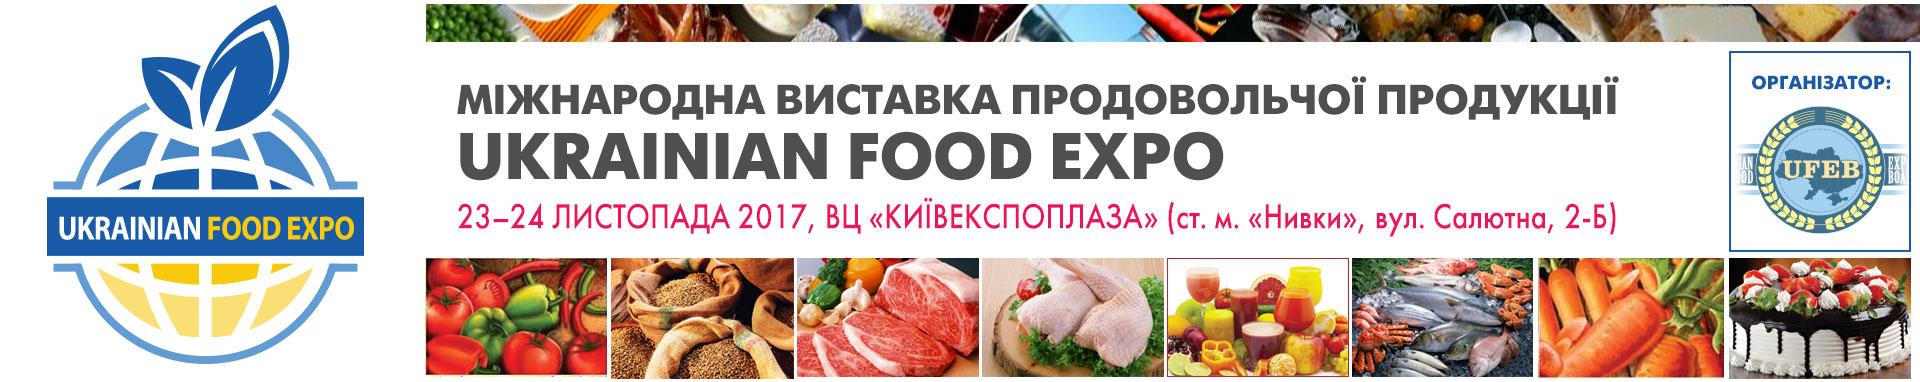 UKRAINIAN FOOD EXPO 2017